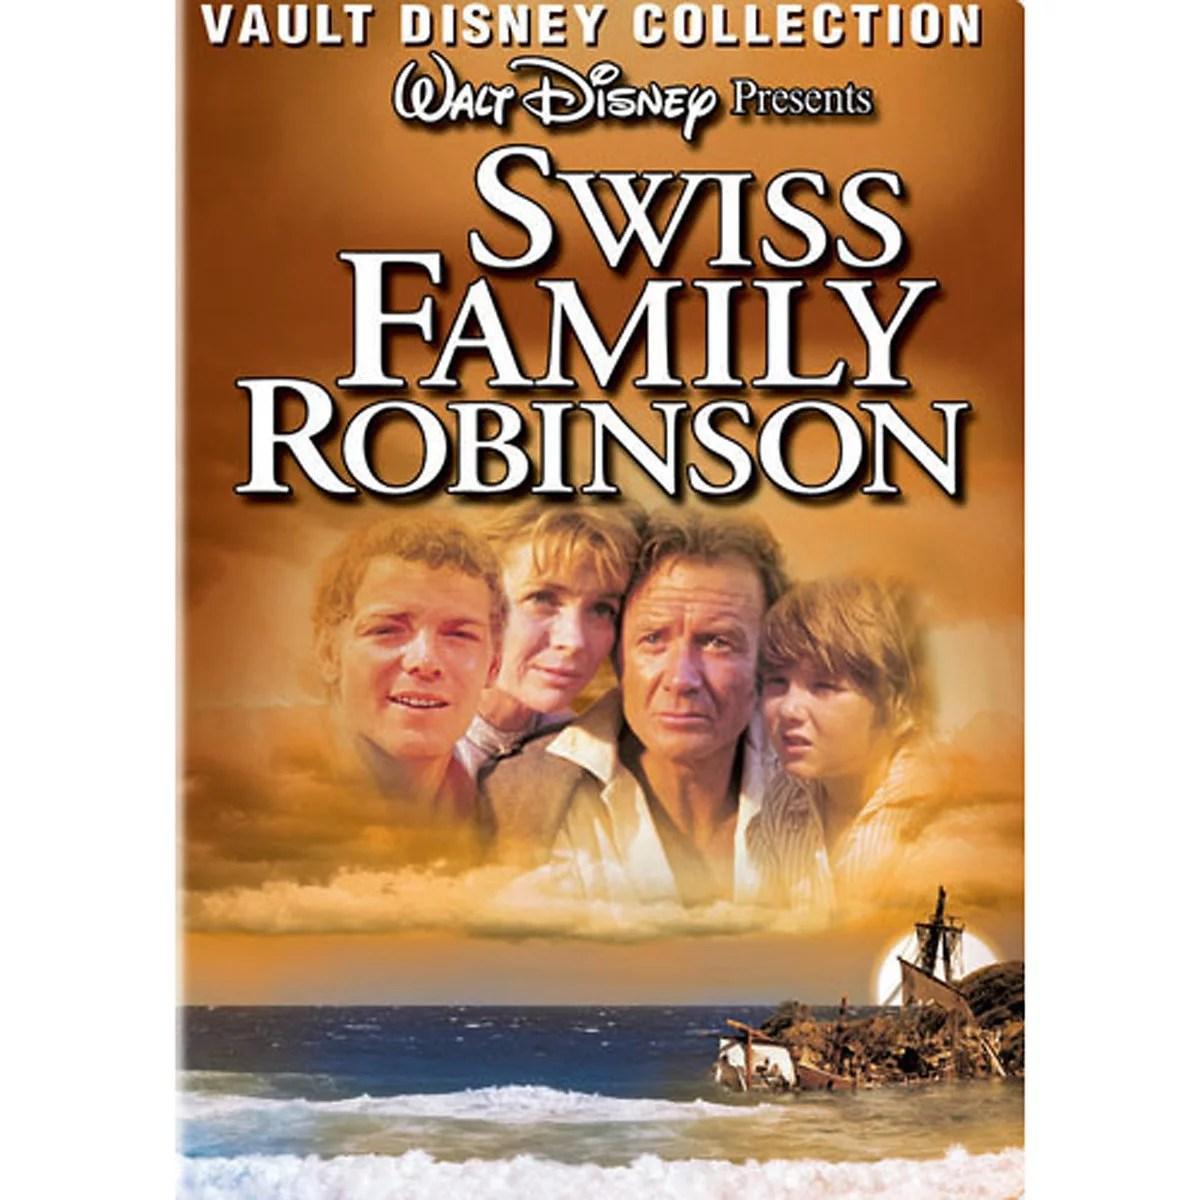 Swiss Family Robinson Vault Disney Collection Dvd